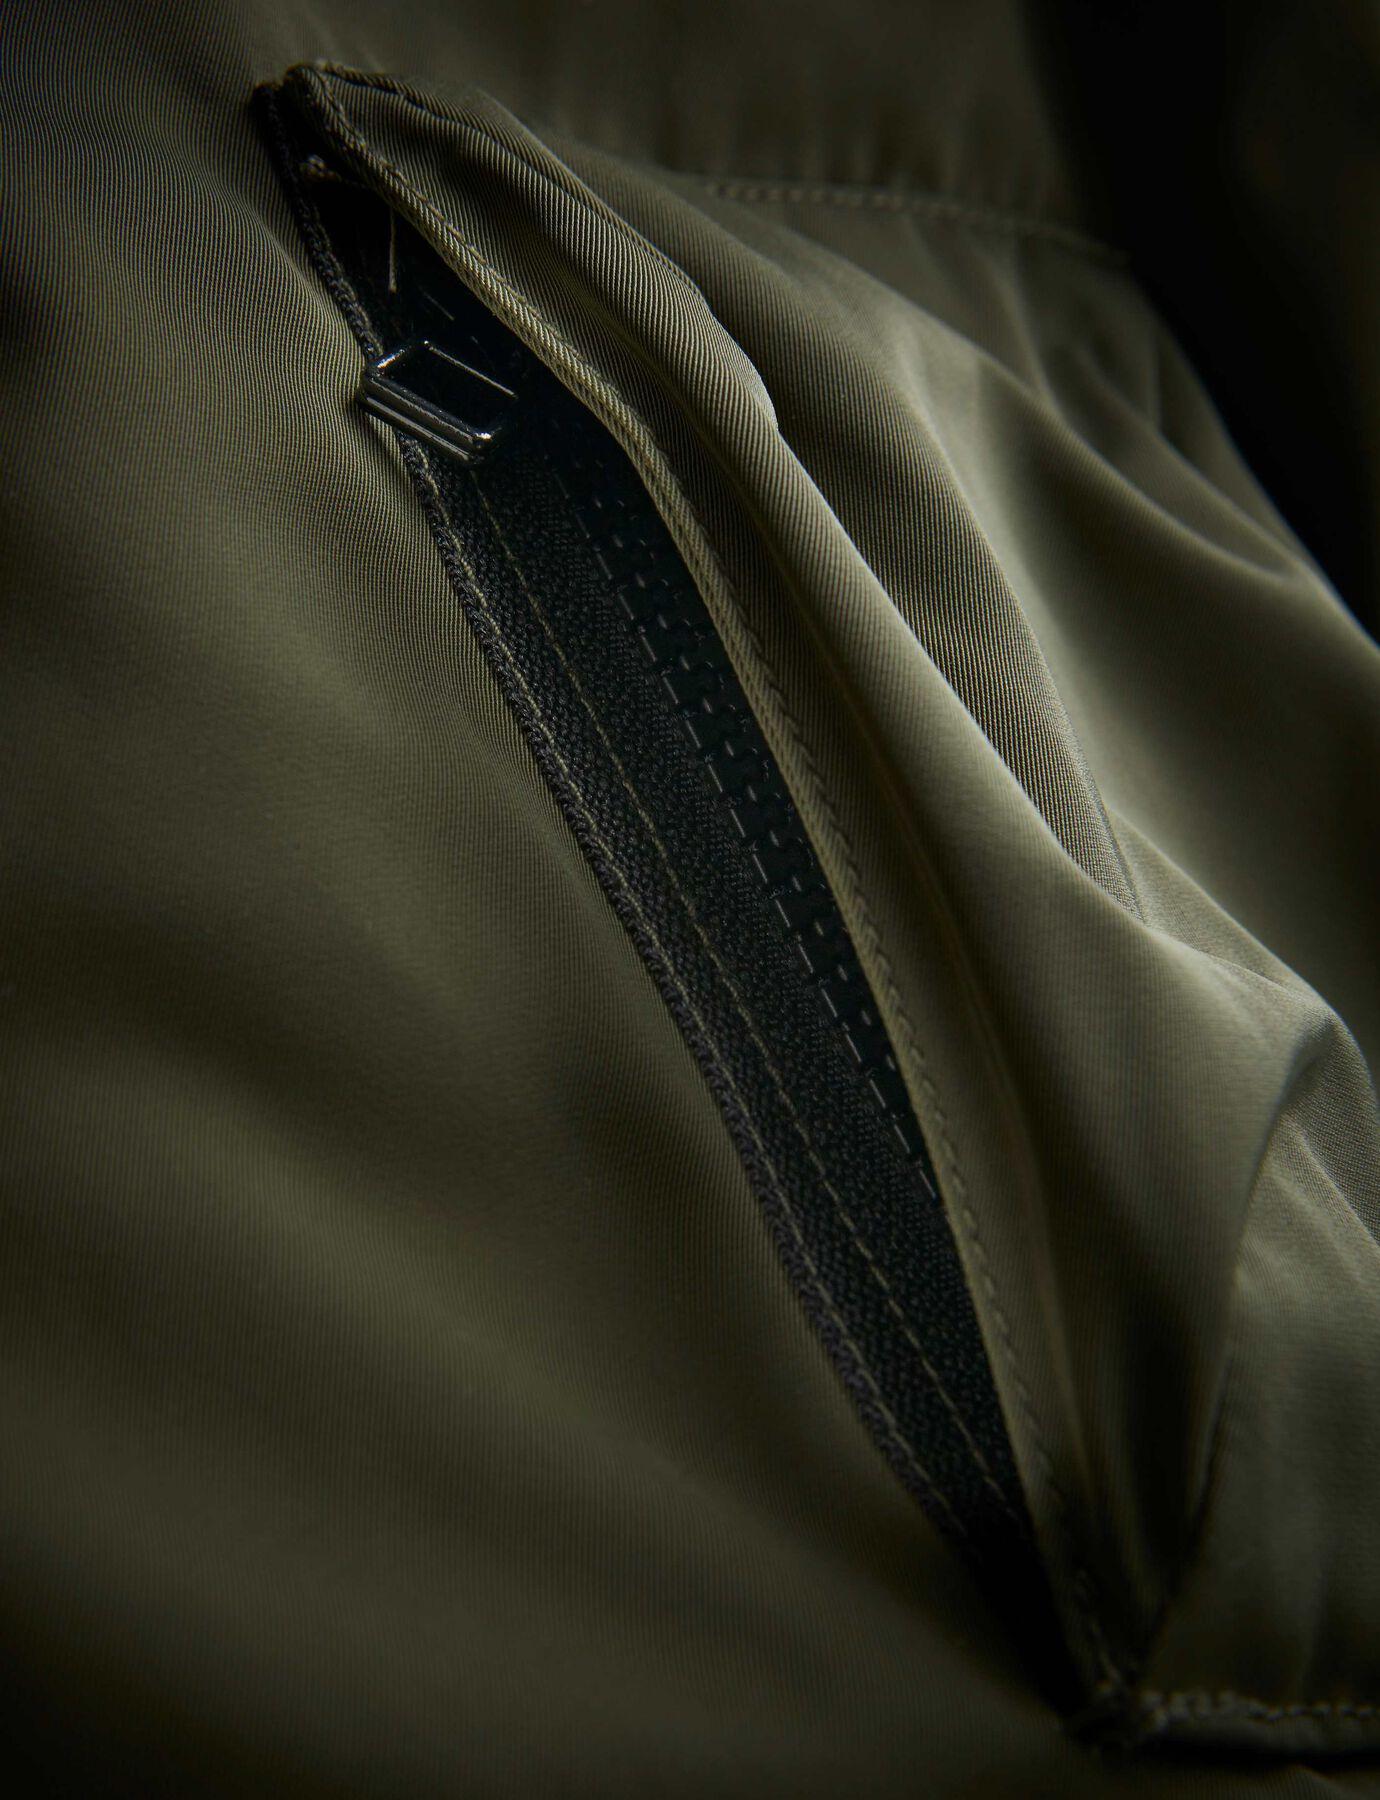 SOB JACKET in Dark Khaki Green from Tiger of Sweden